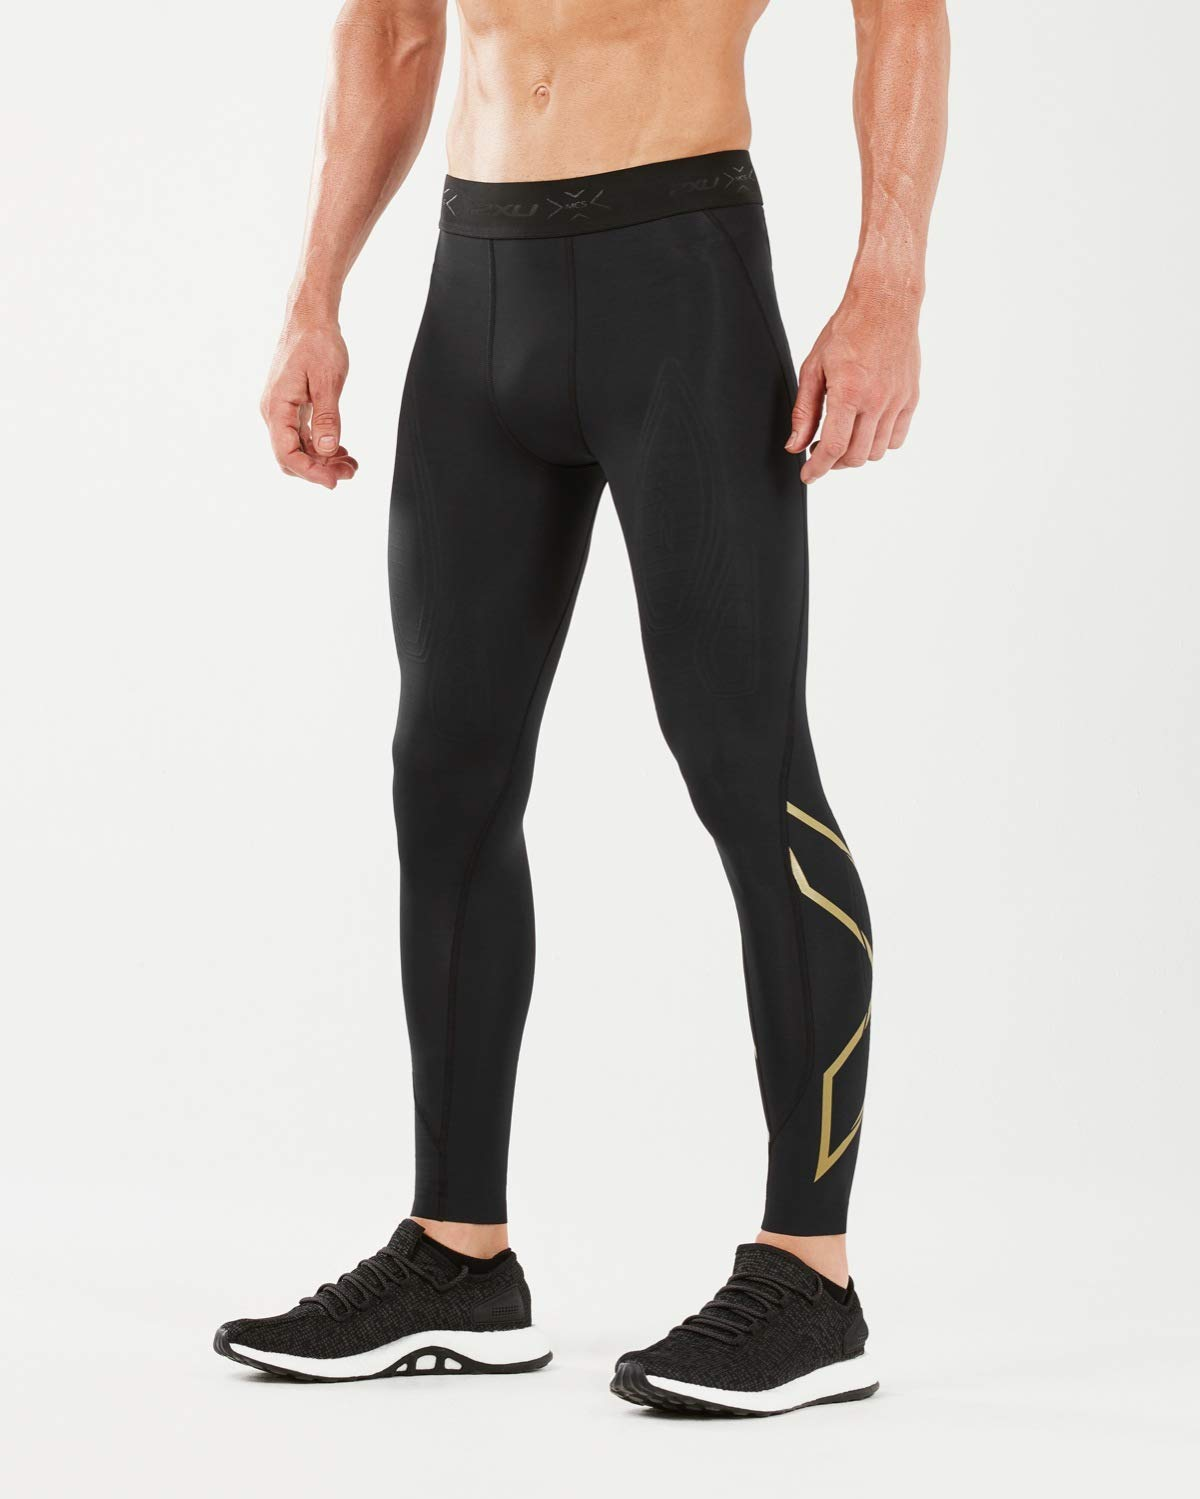 2XU MCS x Training Comp Tights, Black/Gold, Small